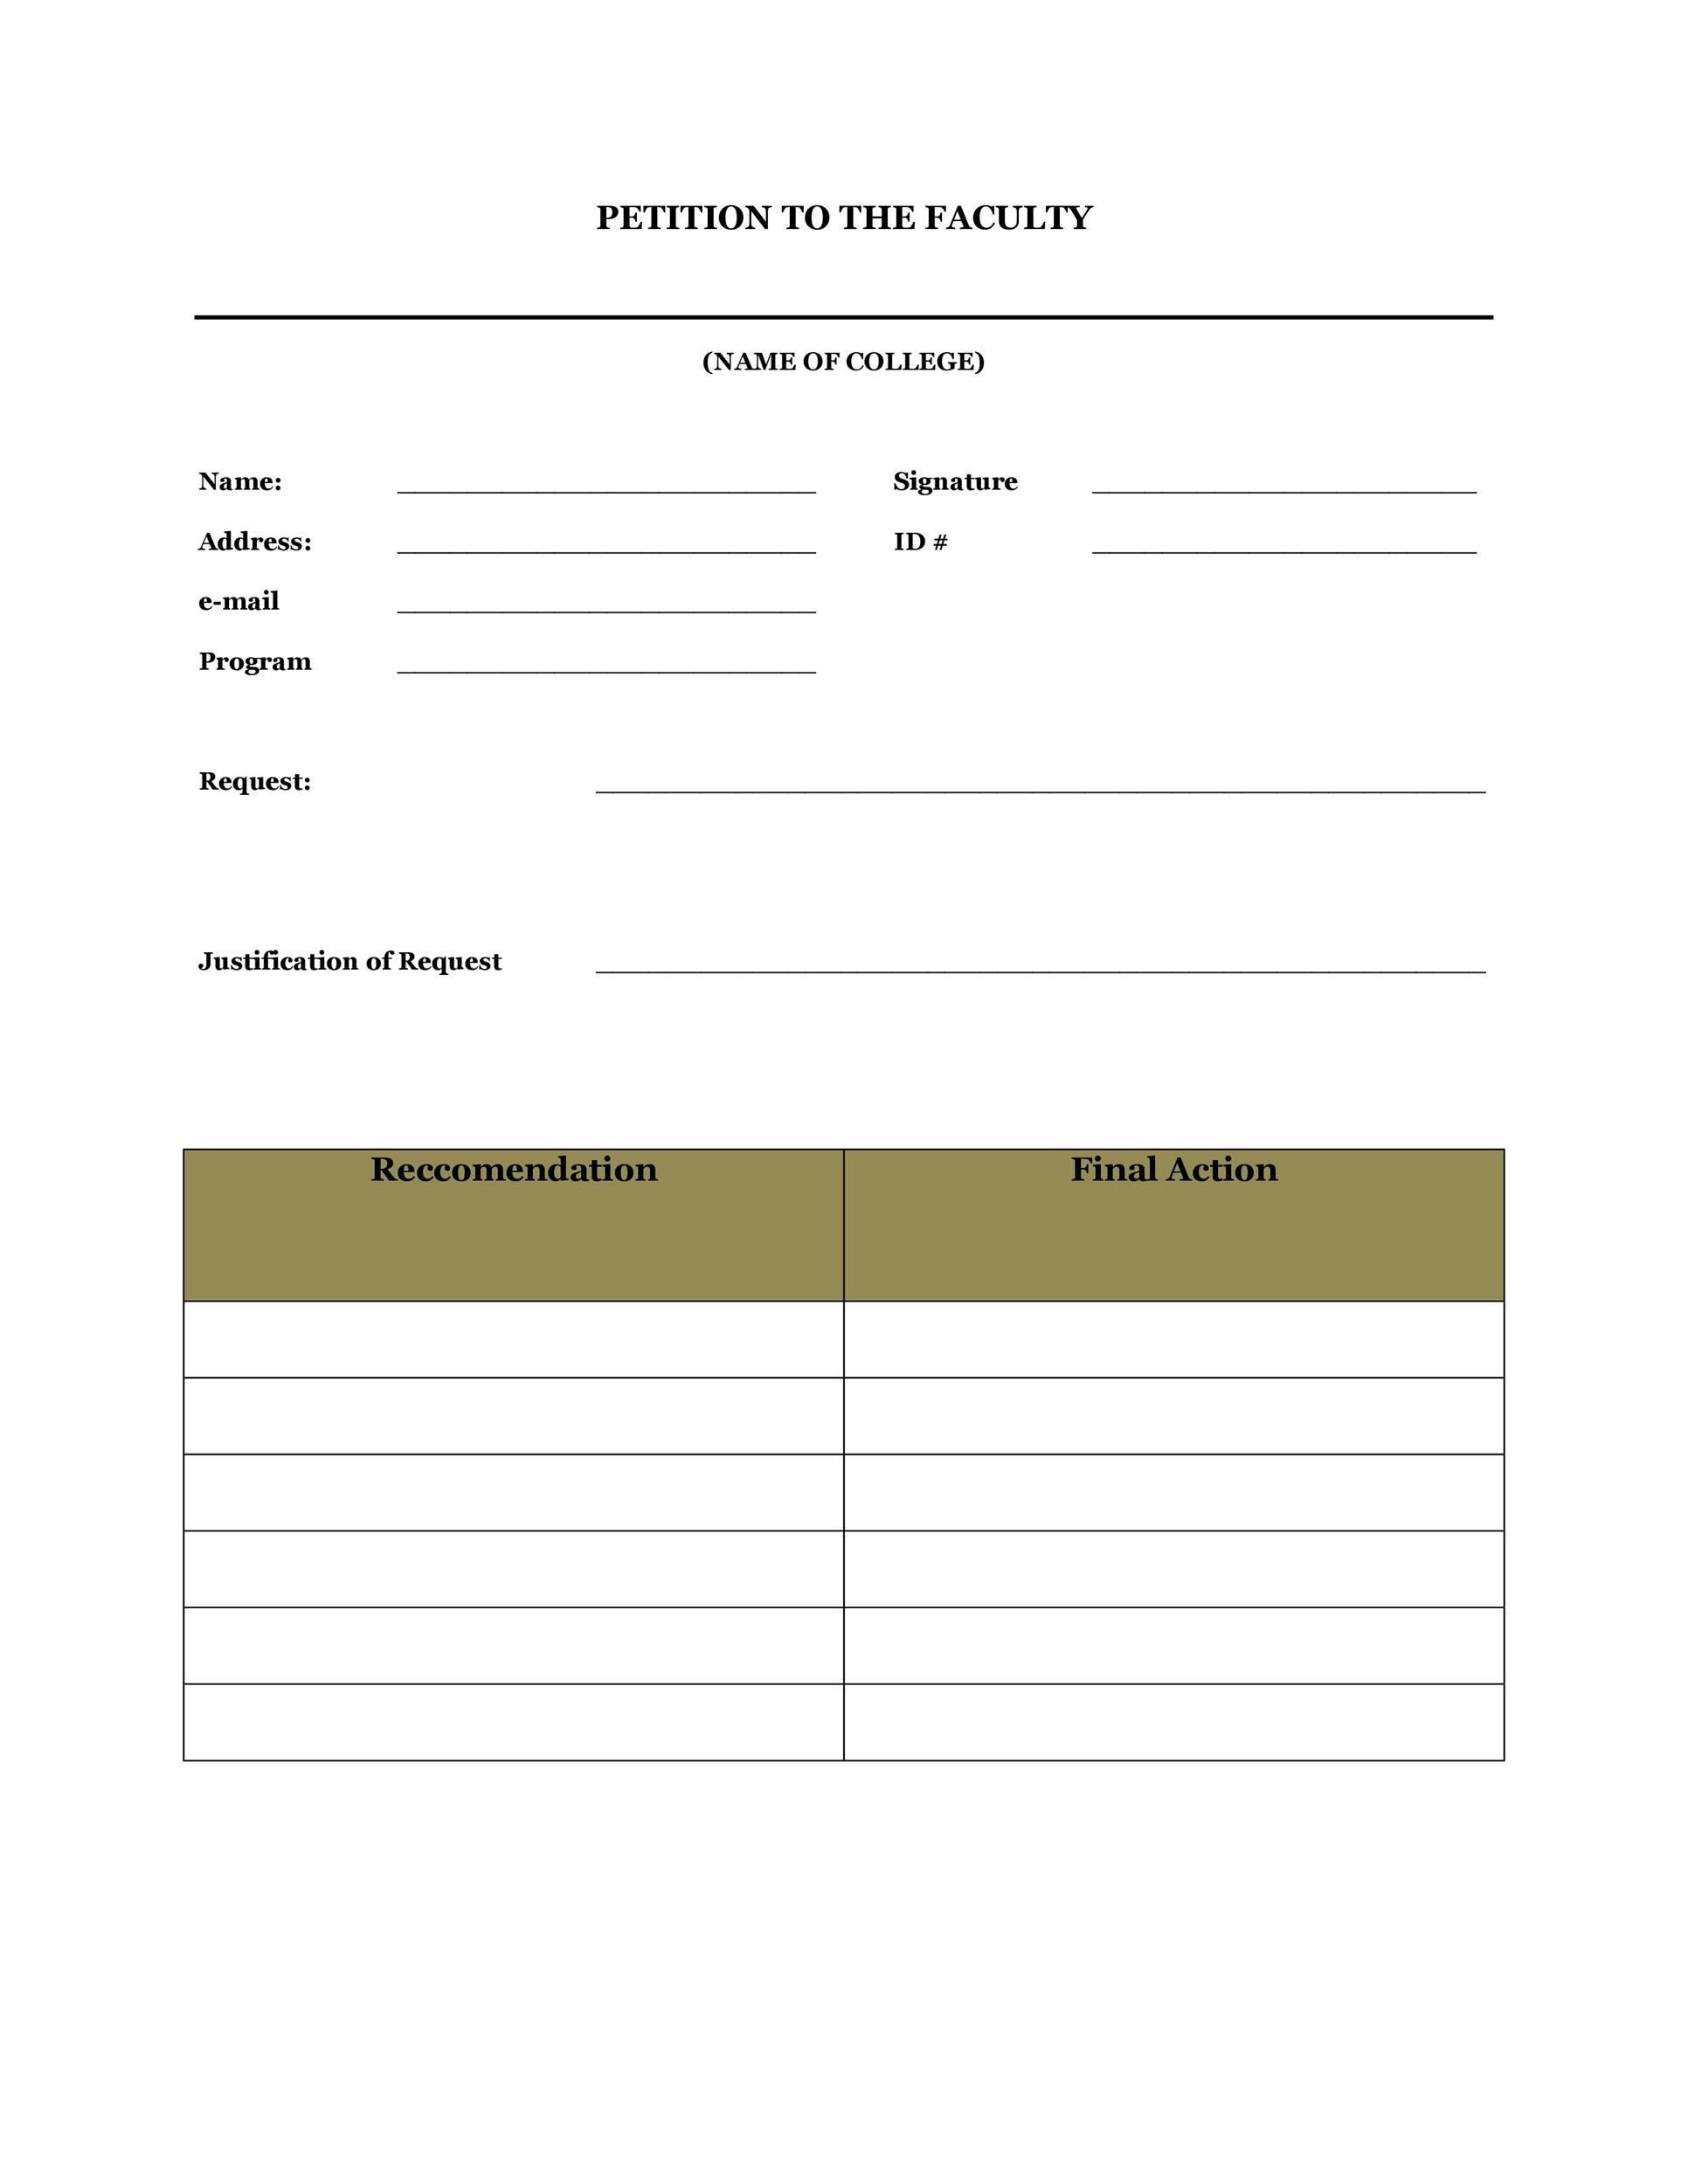 Doc#584552 Free Printable Petition Template u2013 Petition Template - free petition templates examples